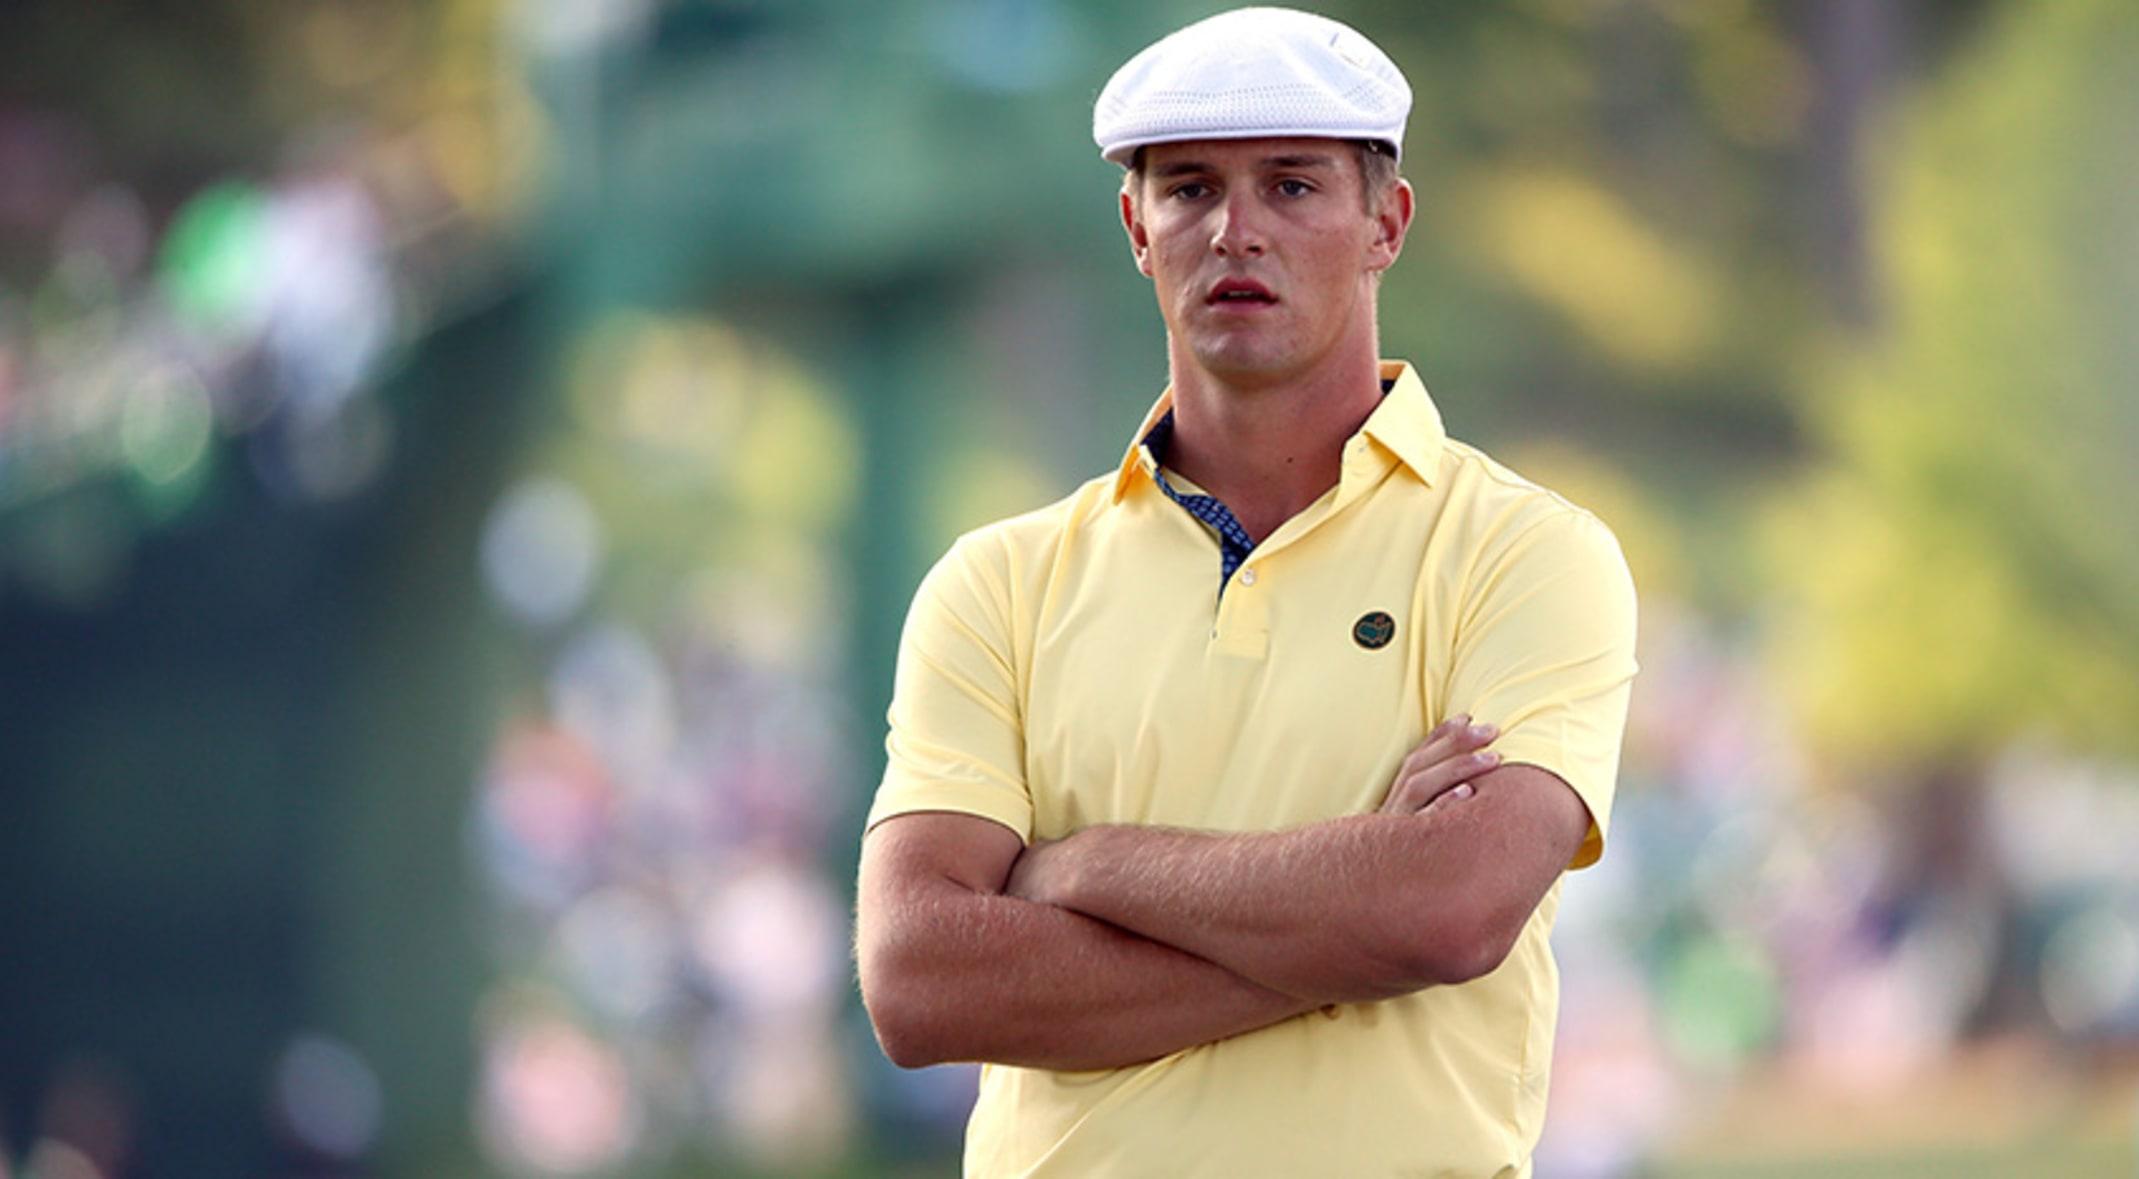 That hilton head amateur golf can not